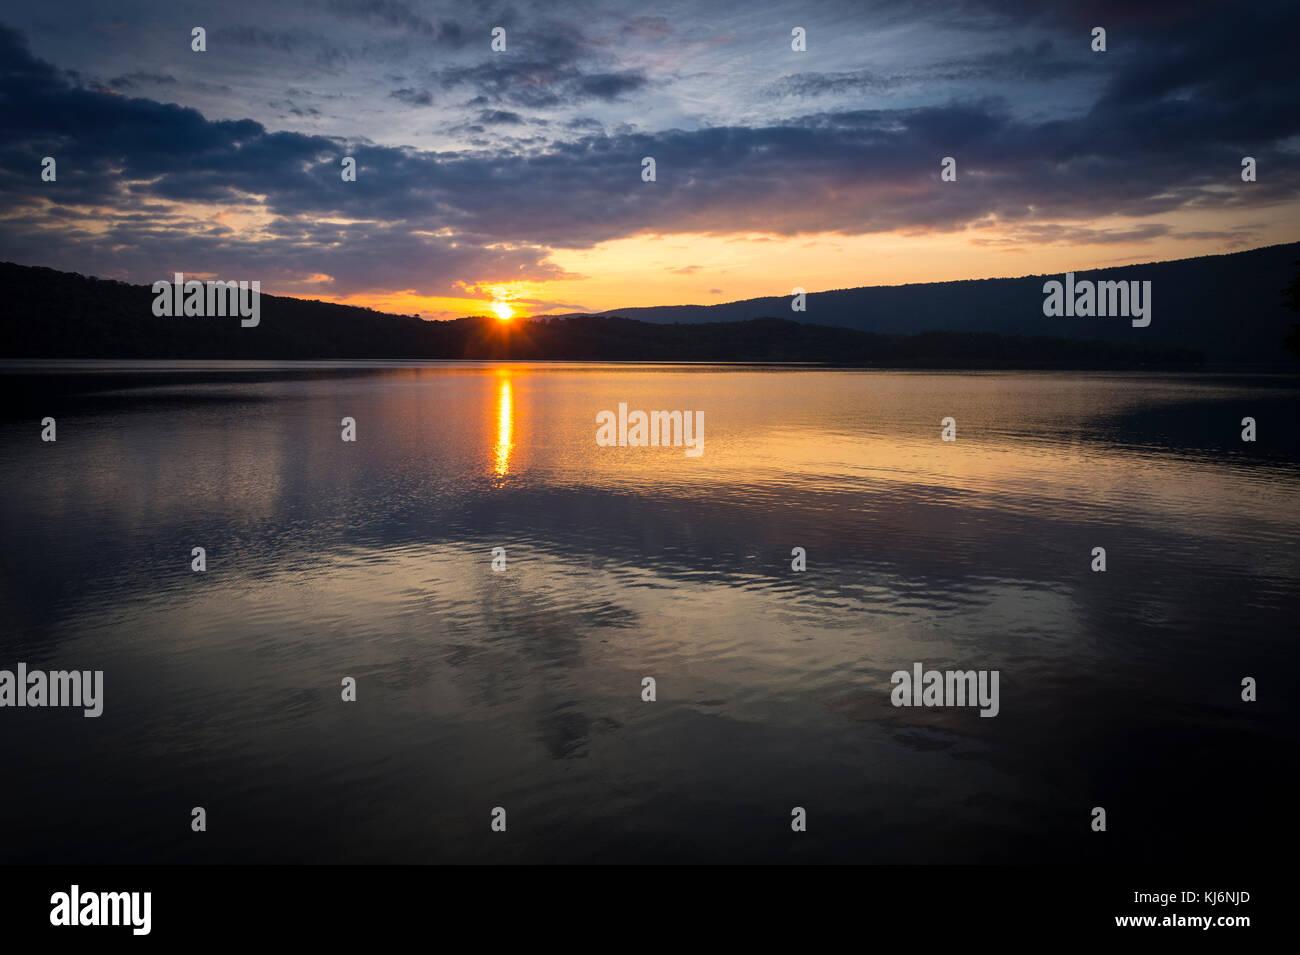 Sun Setting On Mountain Lake, Pennsylvania, USA - Stock Image